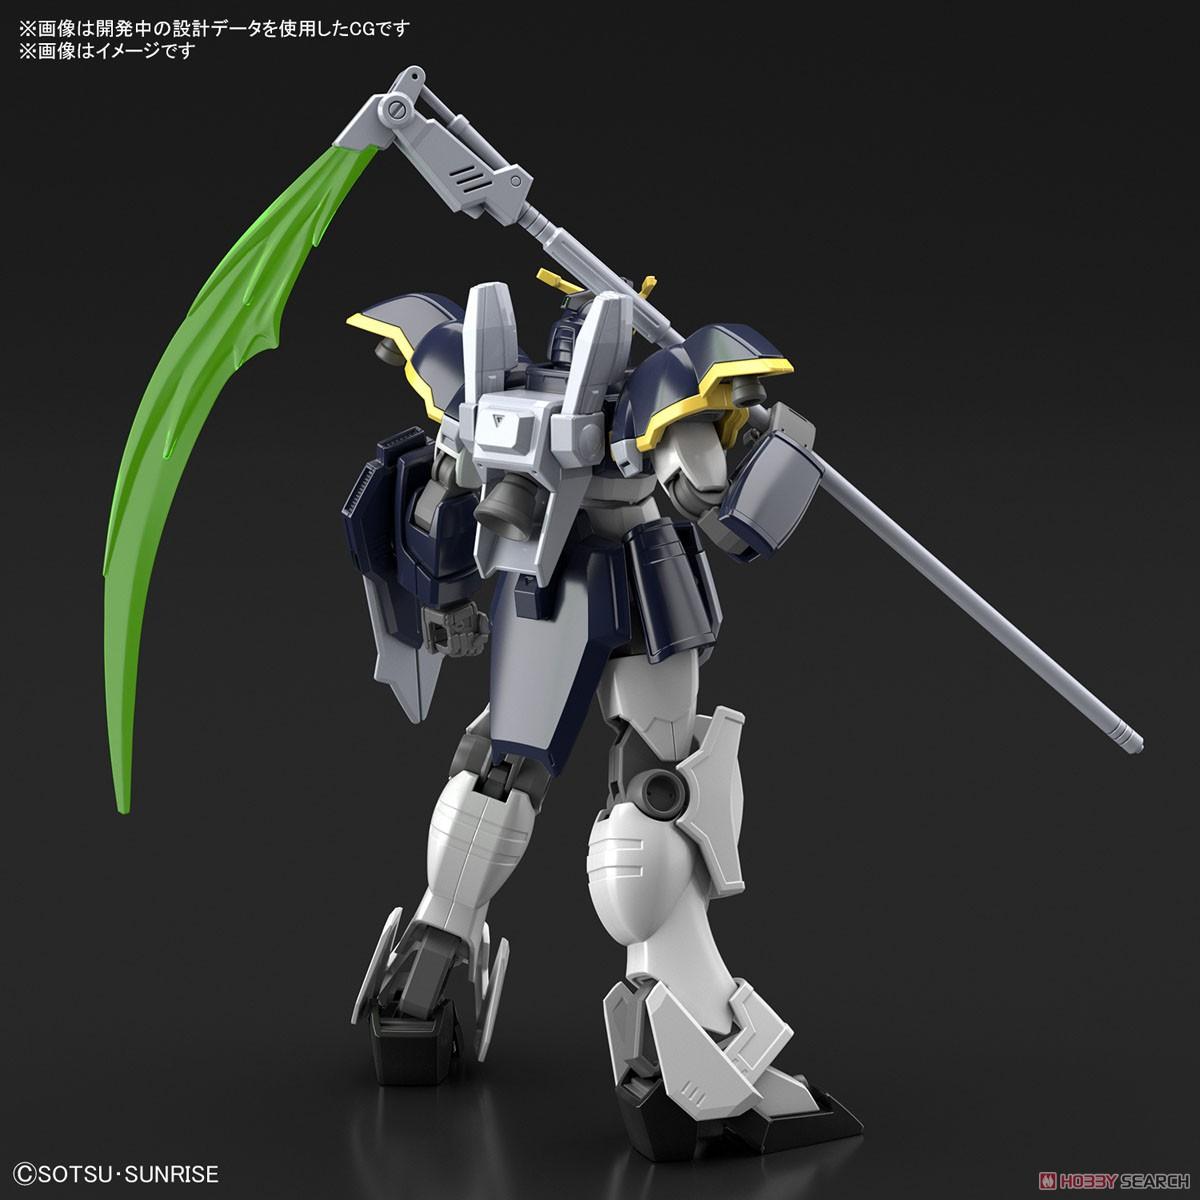 HGAC 1/144『ガンダムデスサイズ』新機動戦記ガンダムW プラモデル-002